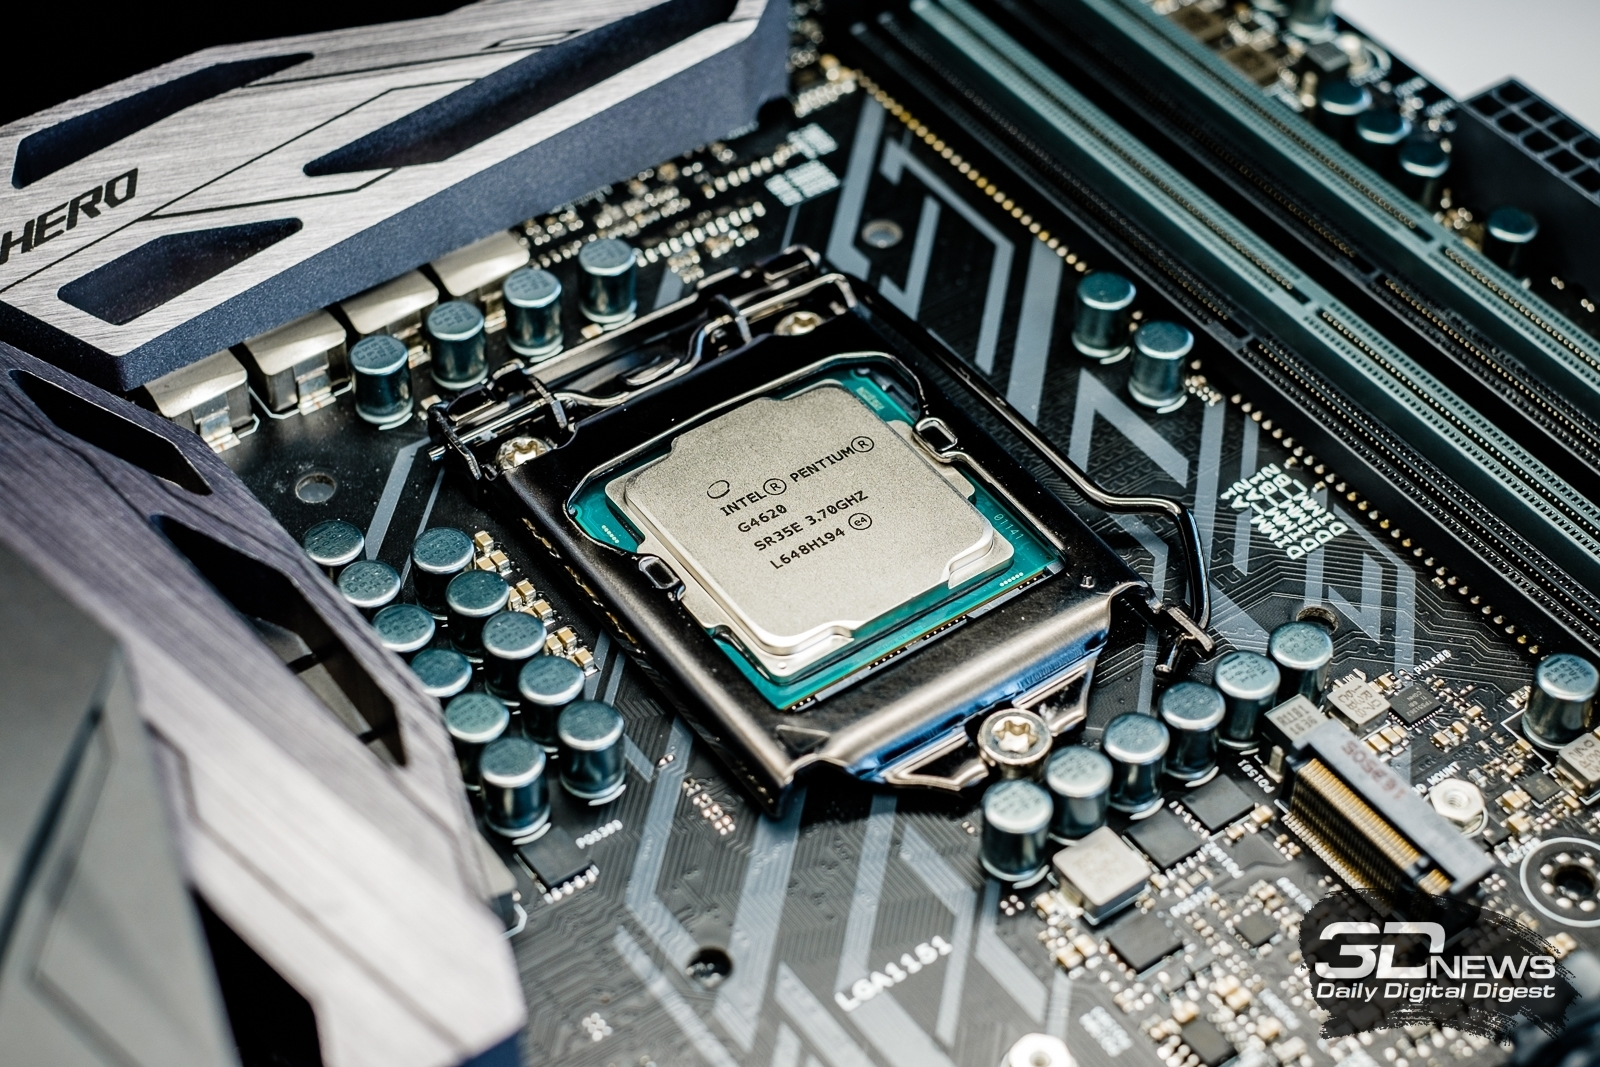 Компьютер месяца — июнь 2017 года